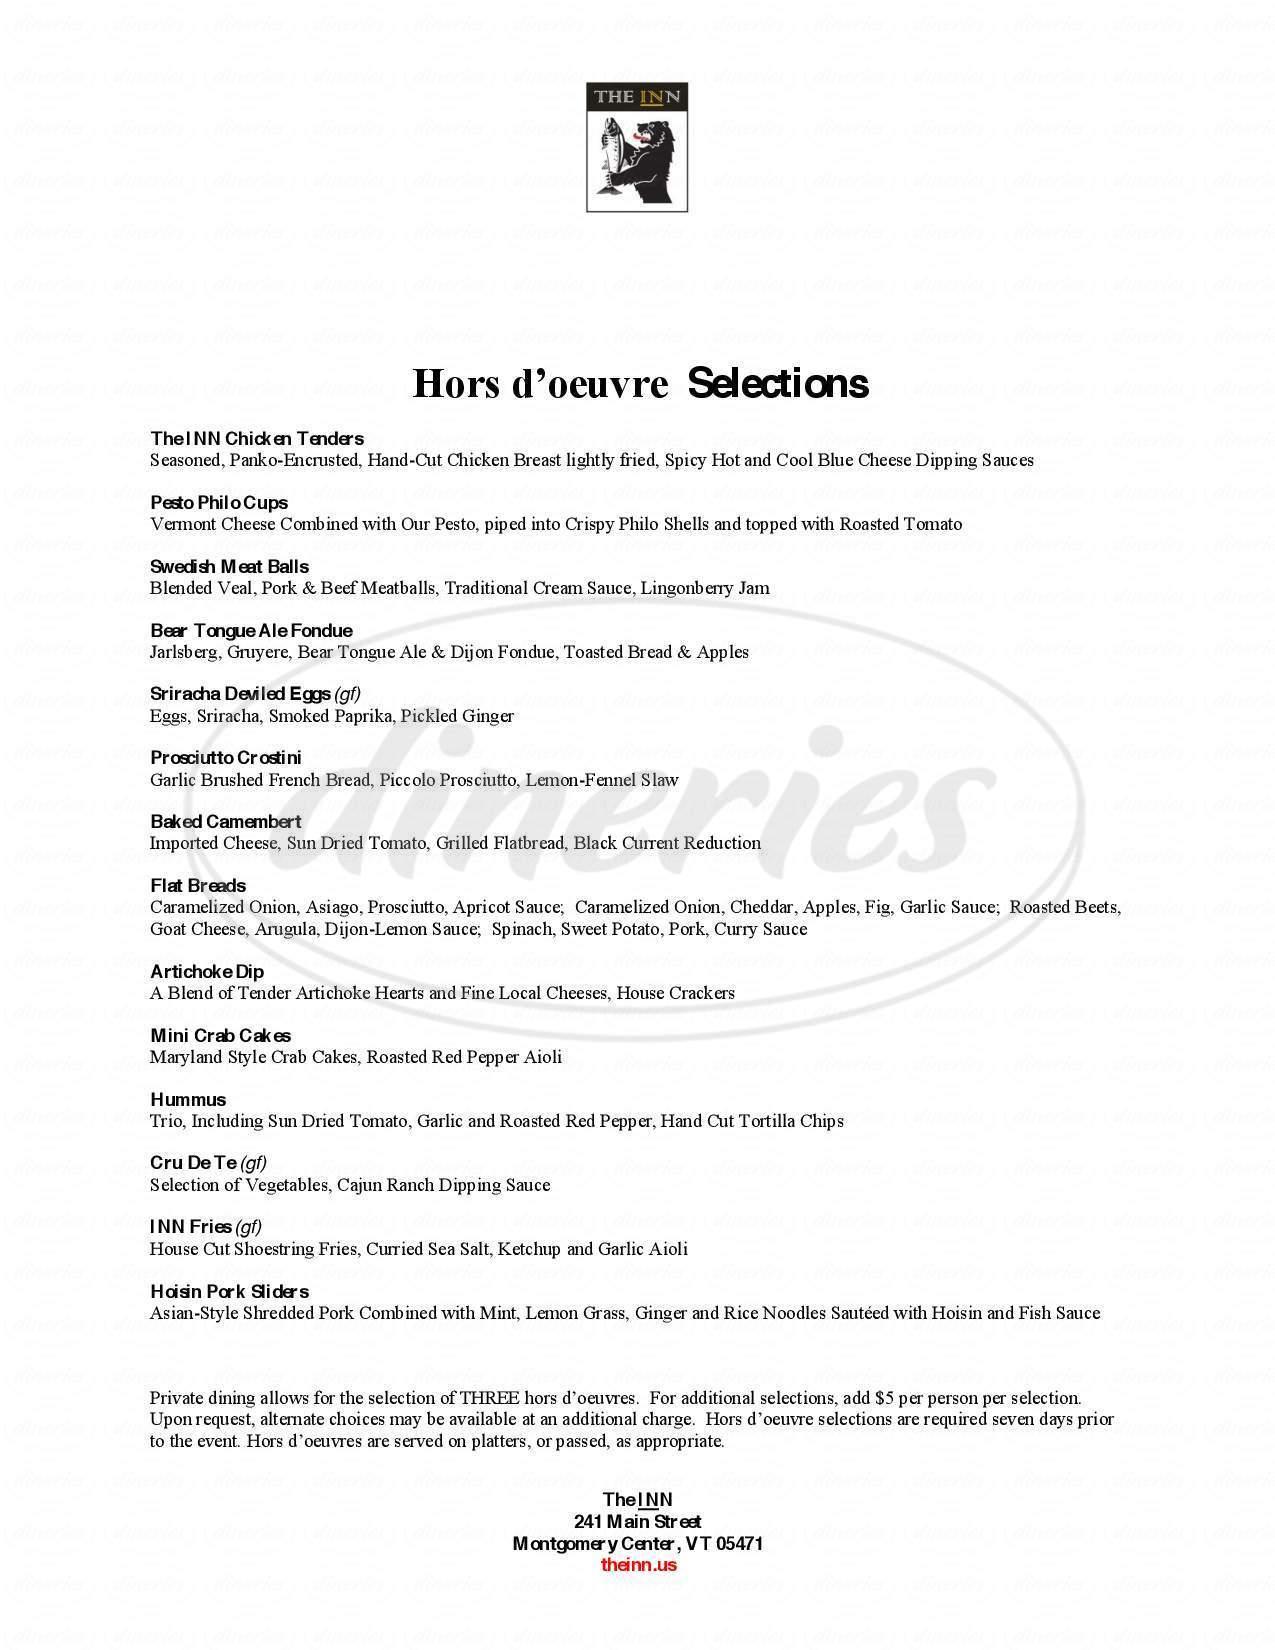 menu for The INN